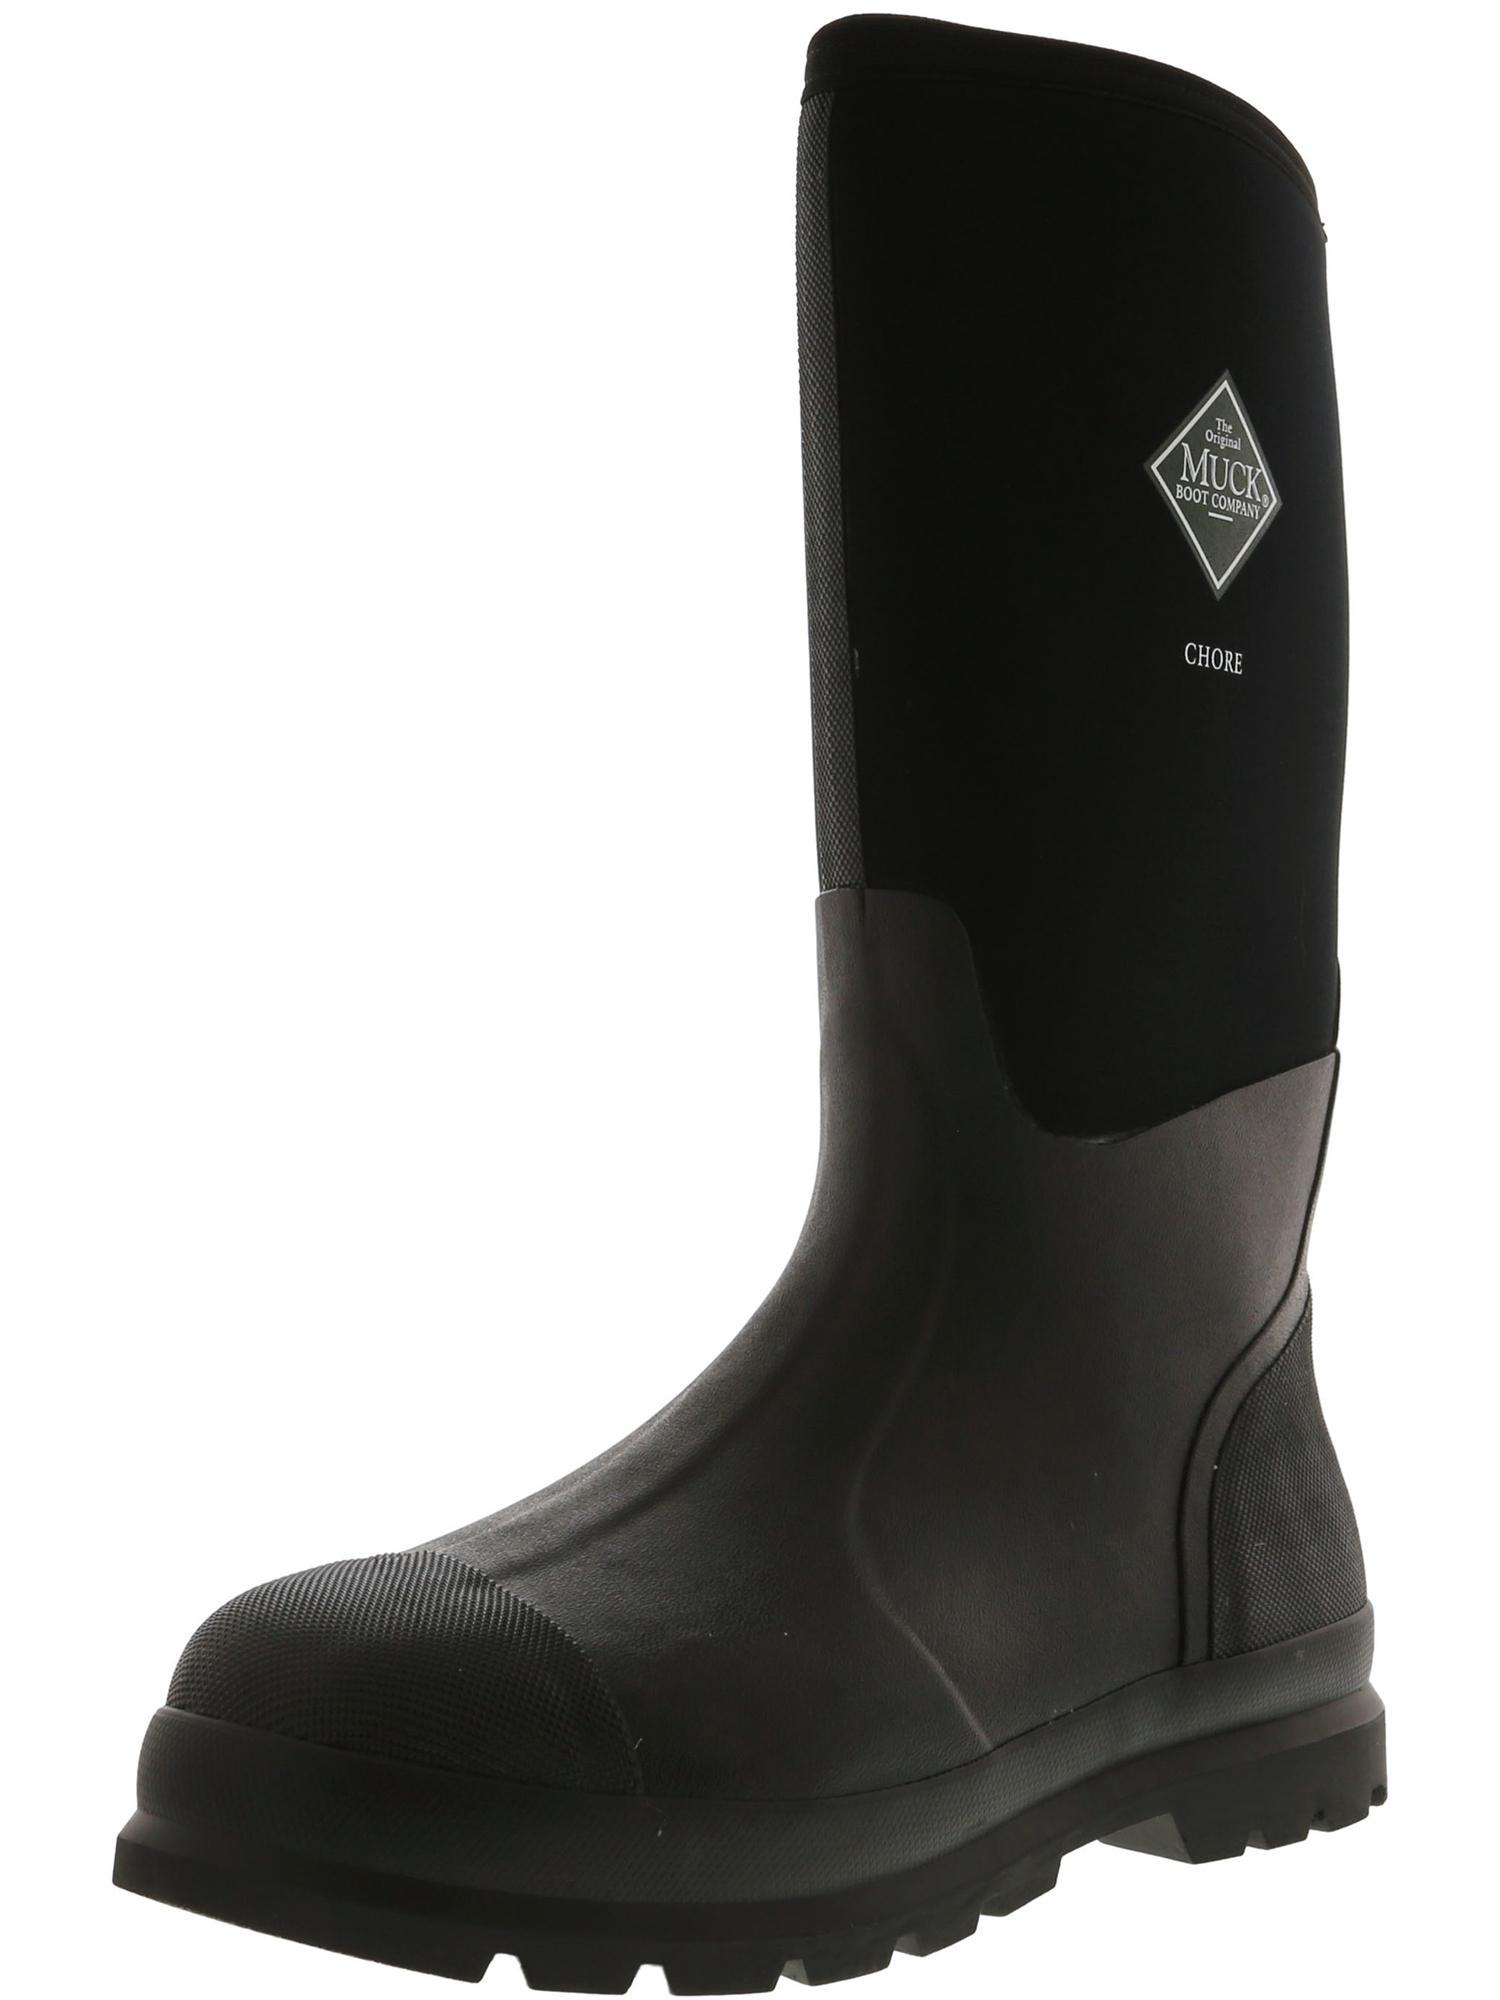 Muck Boot Company Chore Black Knee-High Fabric Rain - 12M / 11M